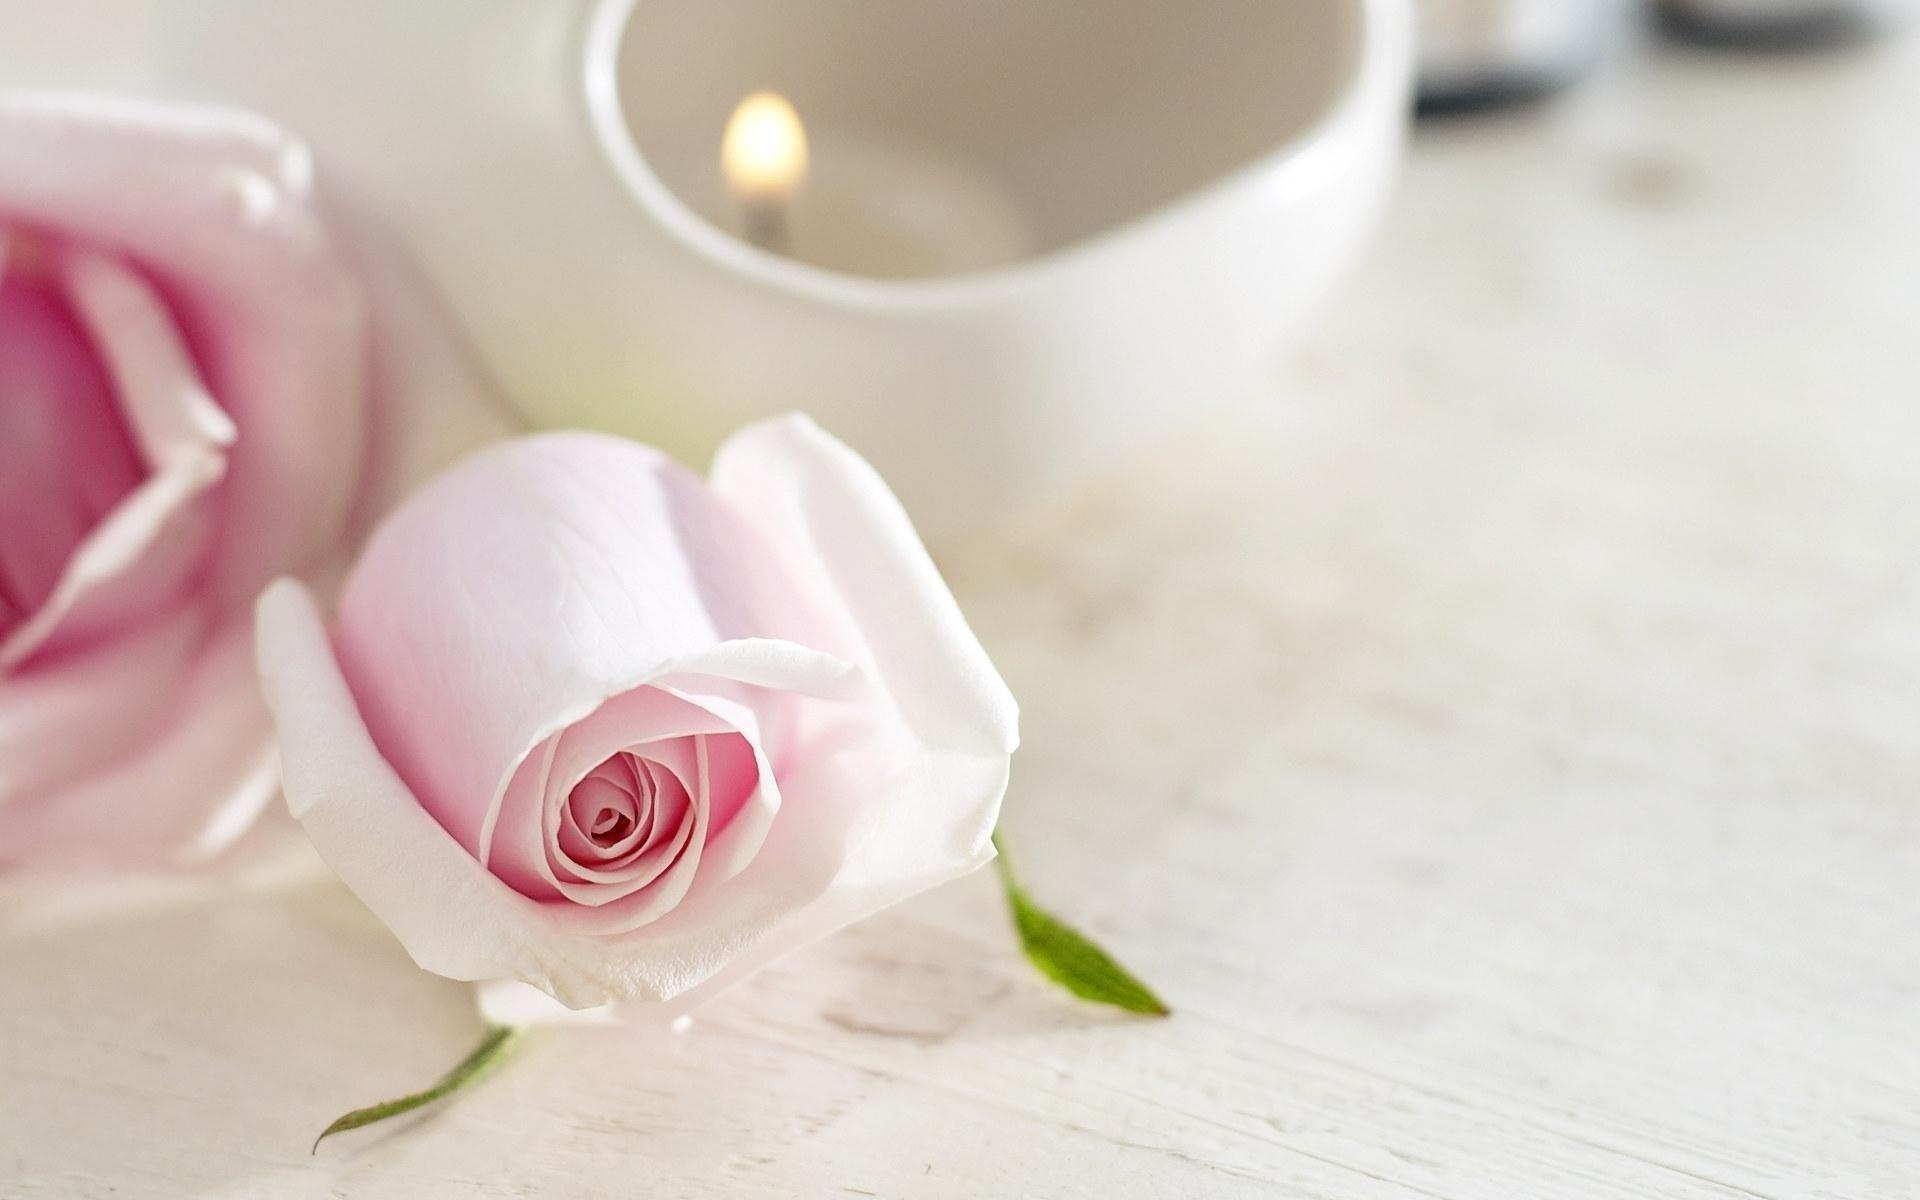 Цветок, роза, свеча, нежность